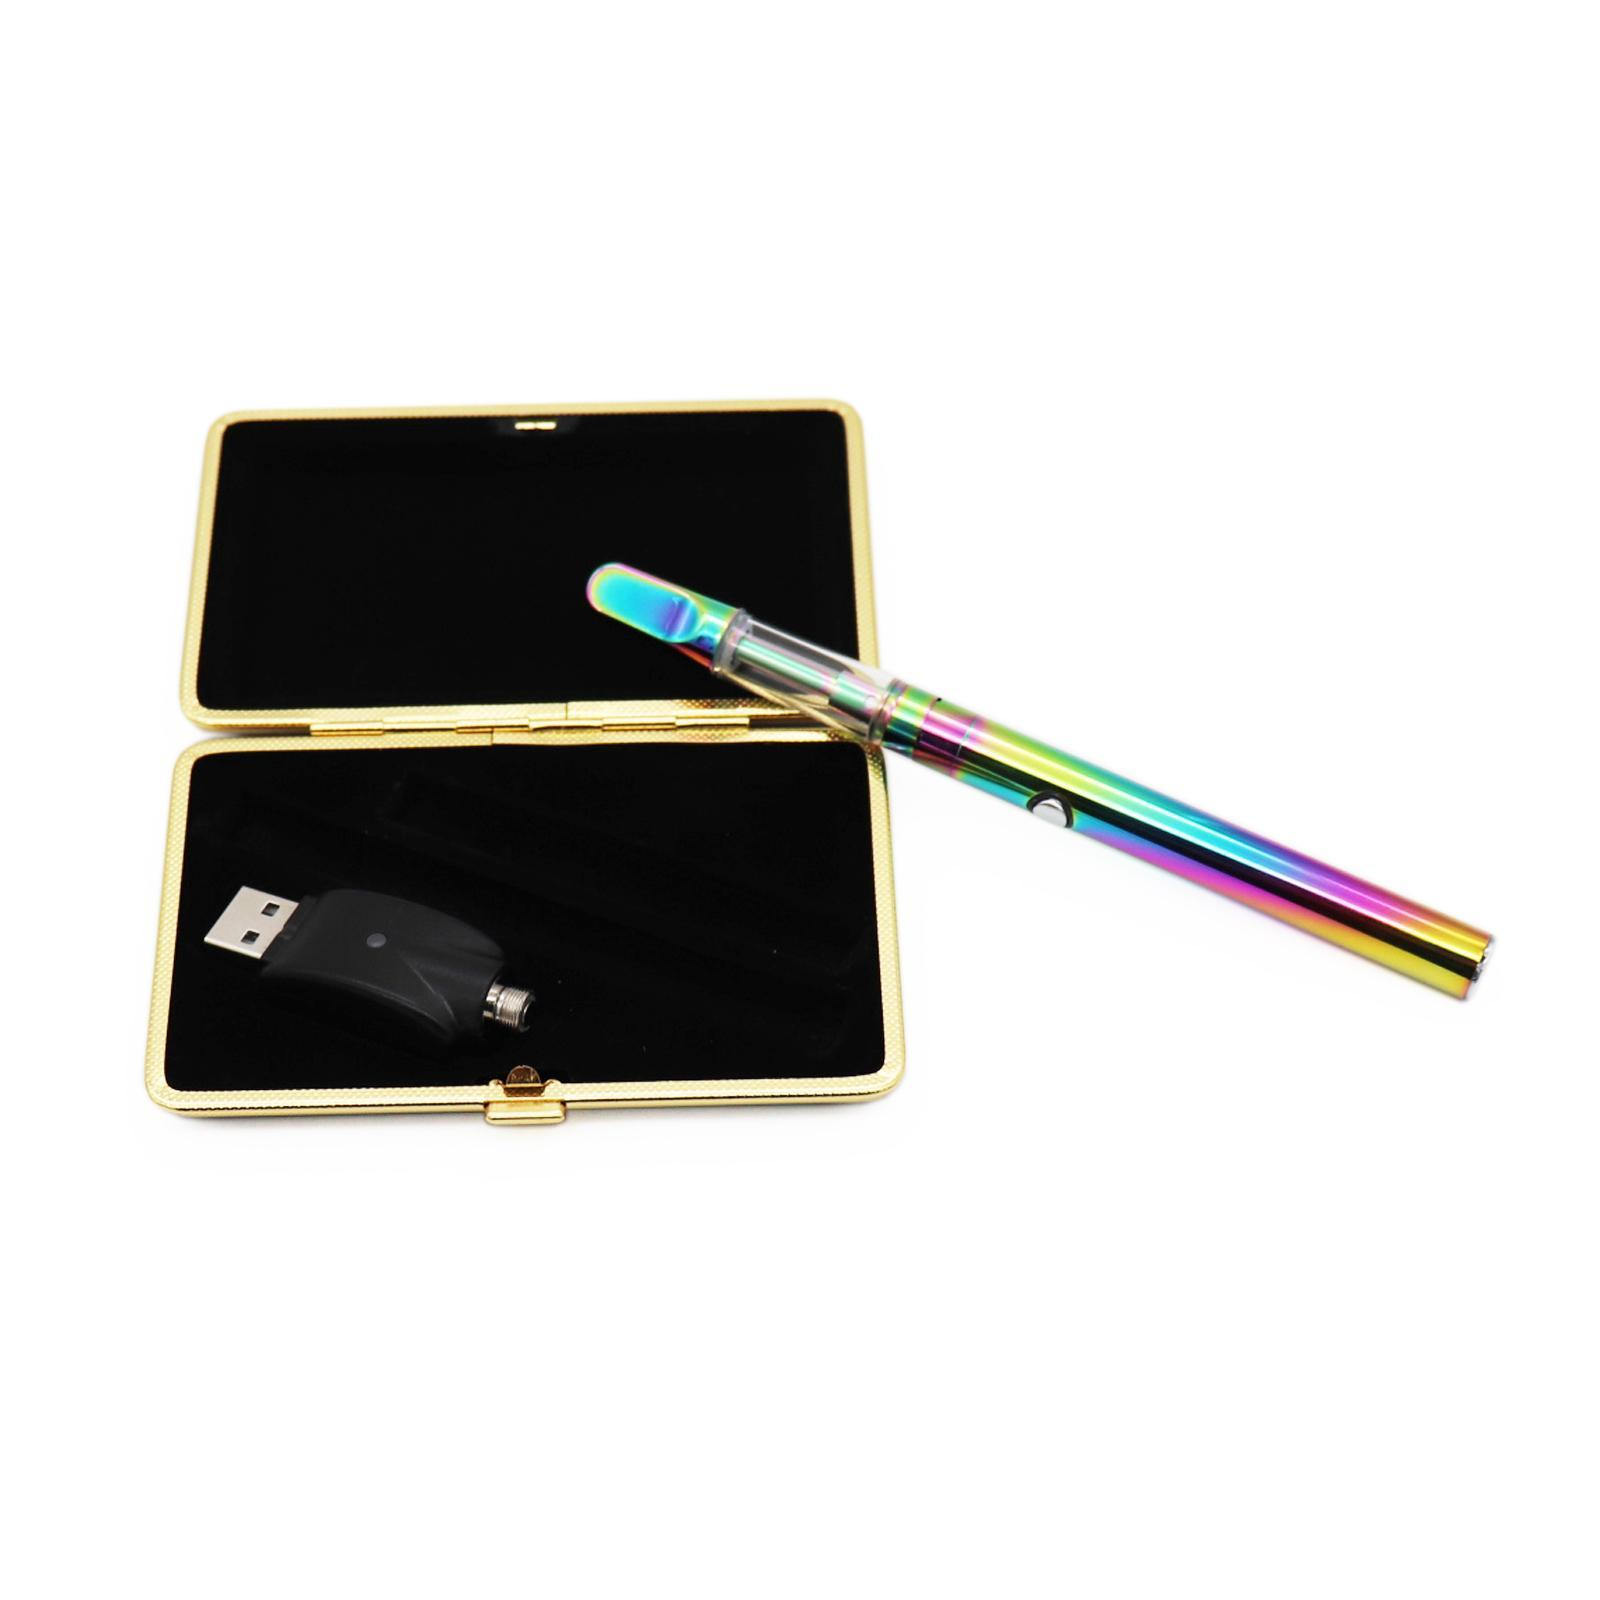 U.S. direct shipping Rainbow Vape Pen Kits Electronic Cigarette Pen 510 Thread Wax Pen Cartridge with 400mah Battery Charger